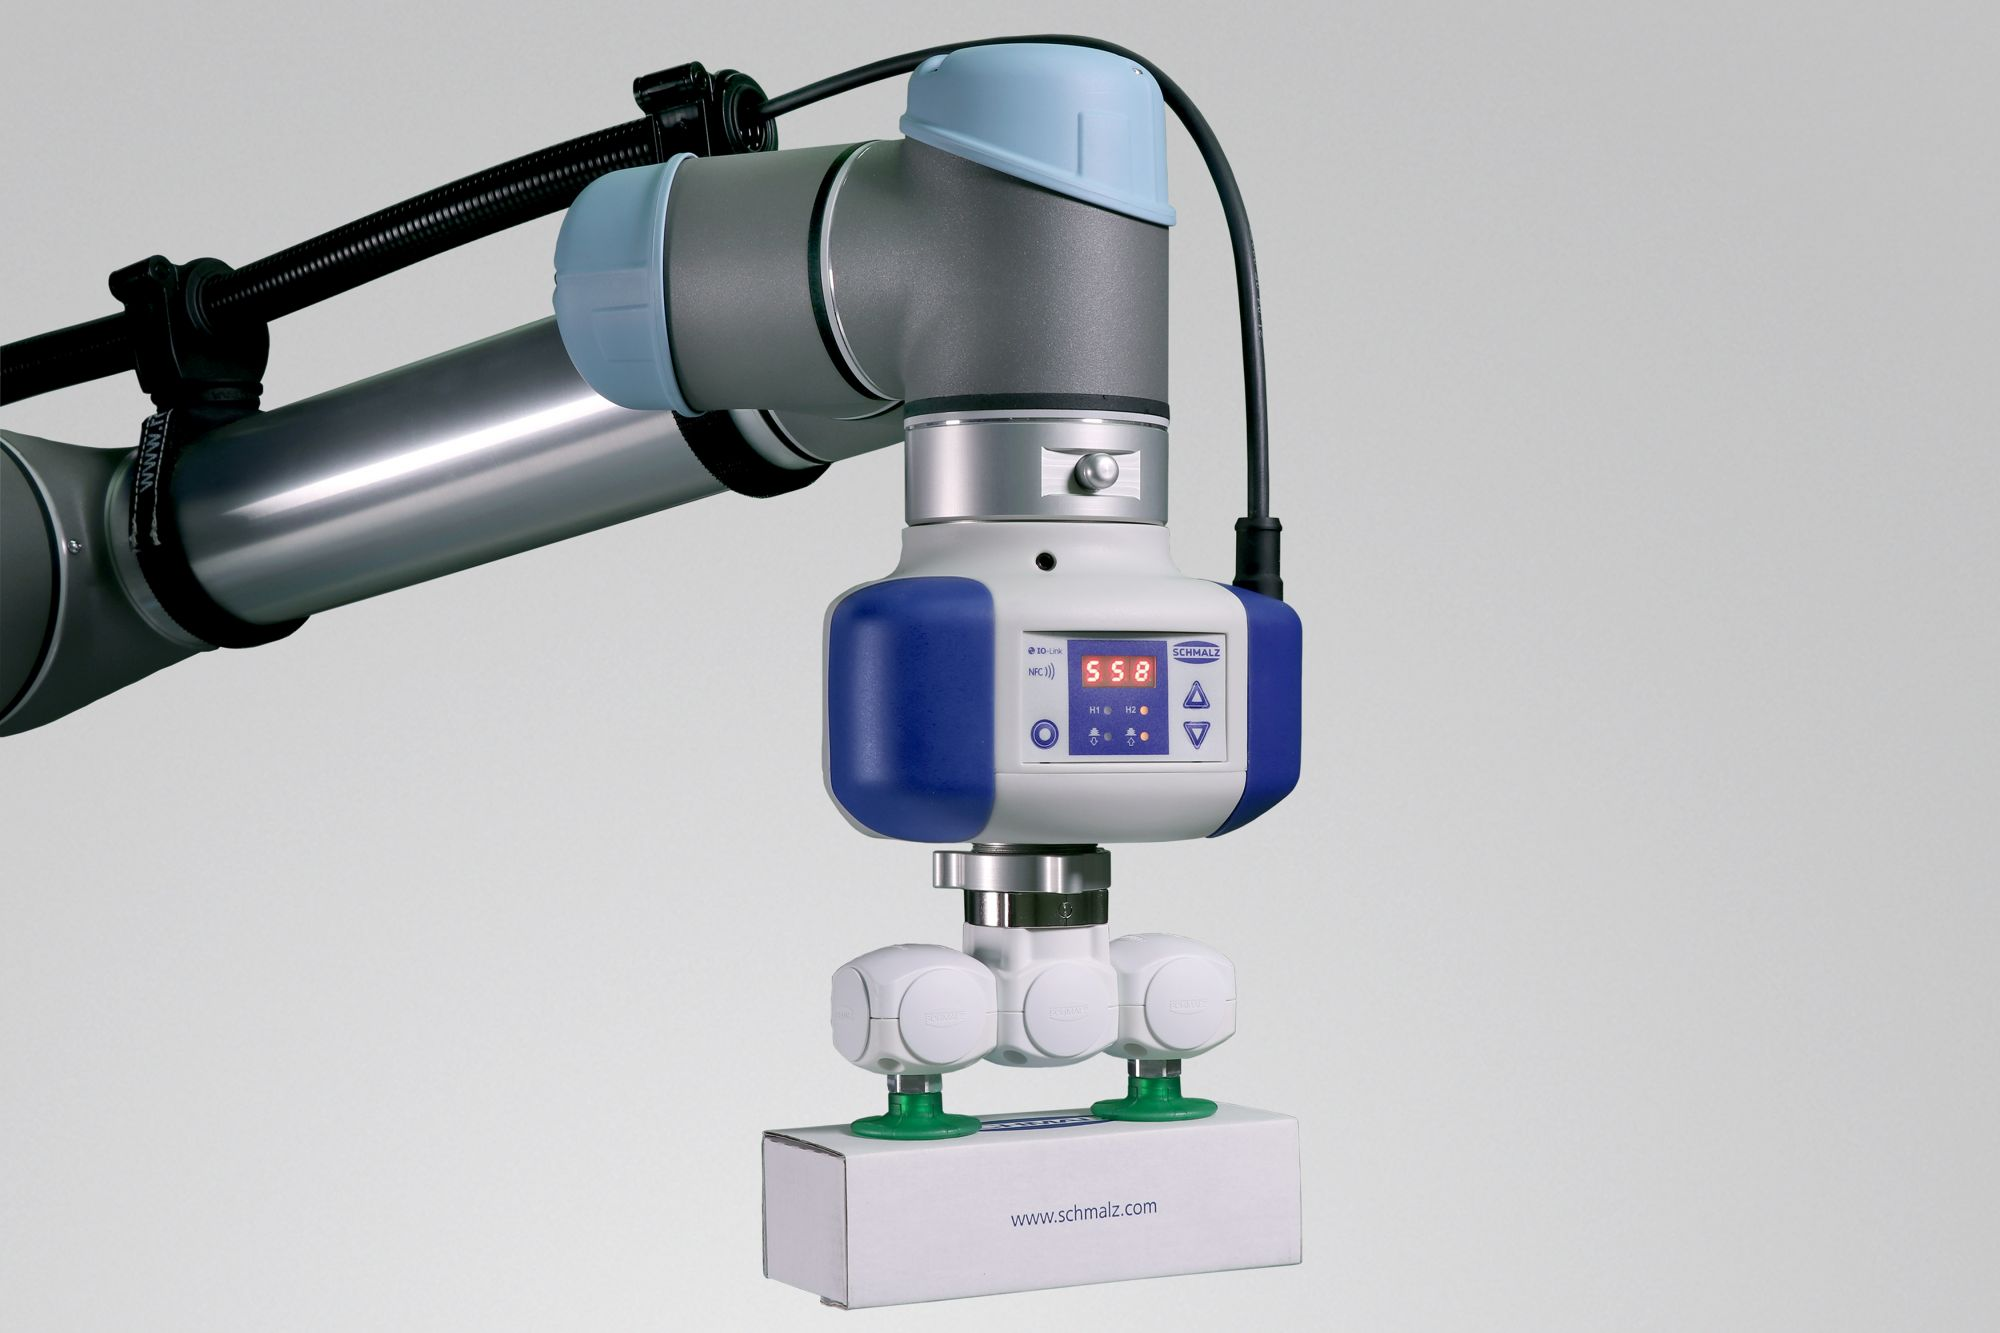 Pneumatik Bedeutet Bei Robotern: Spezialaufgaben Oder Vakuum